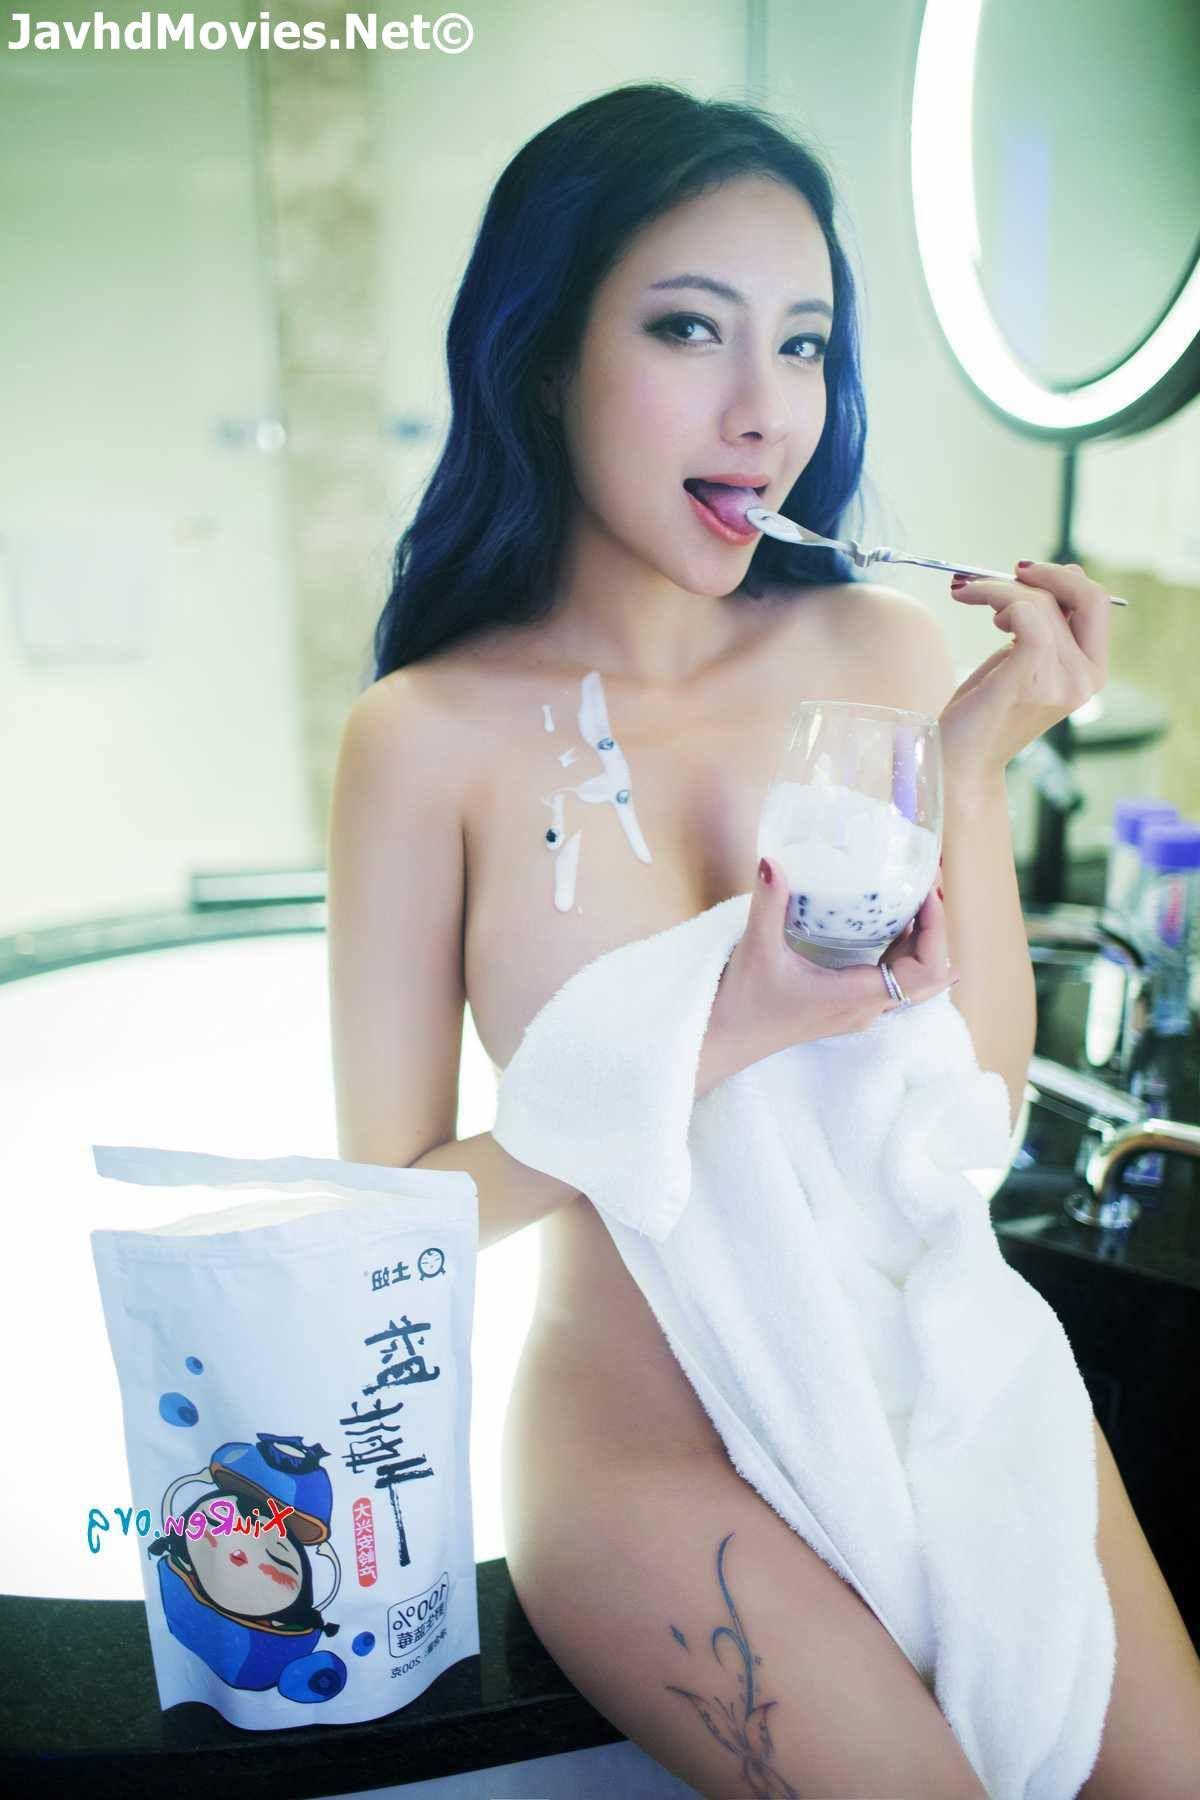 Watch Free Japanese Porn Online